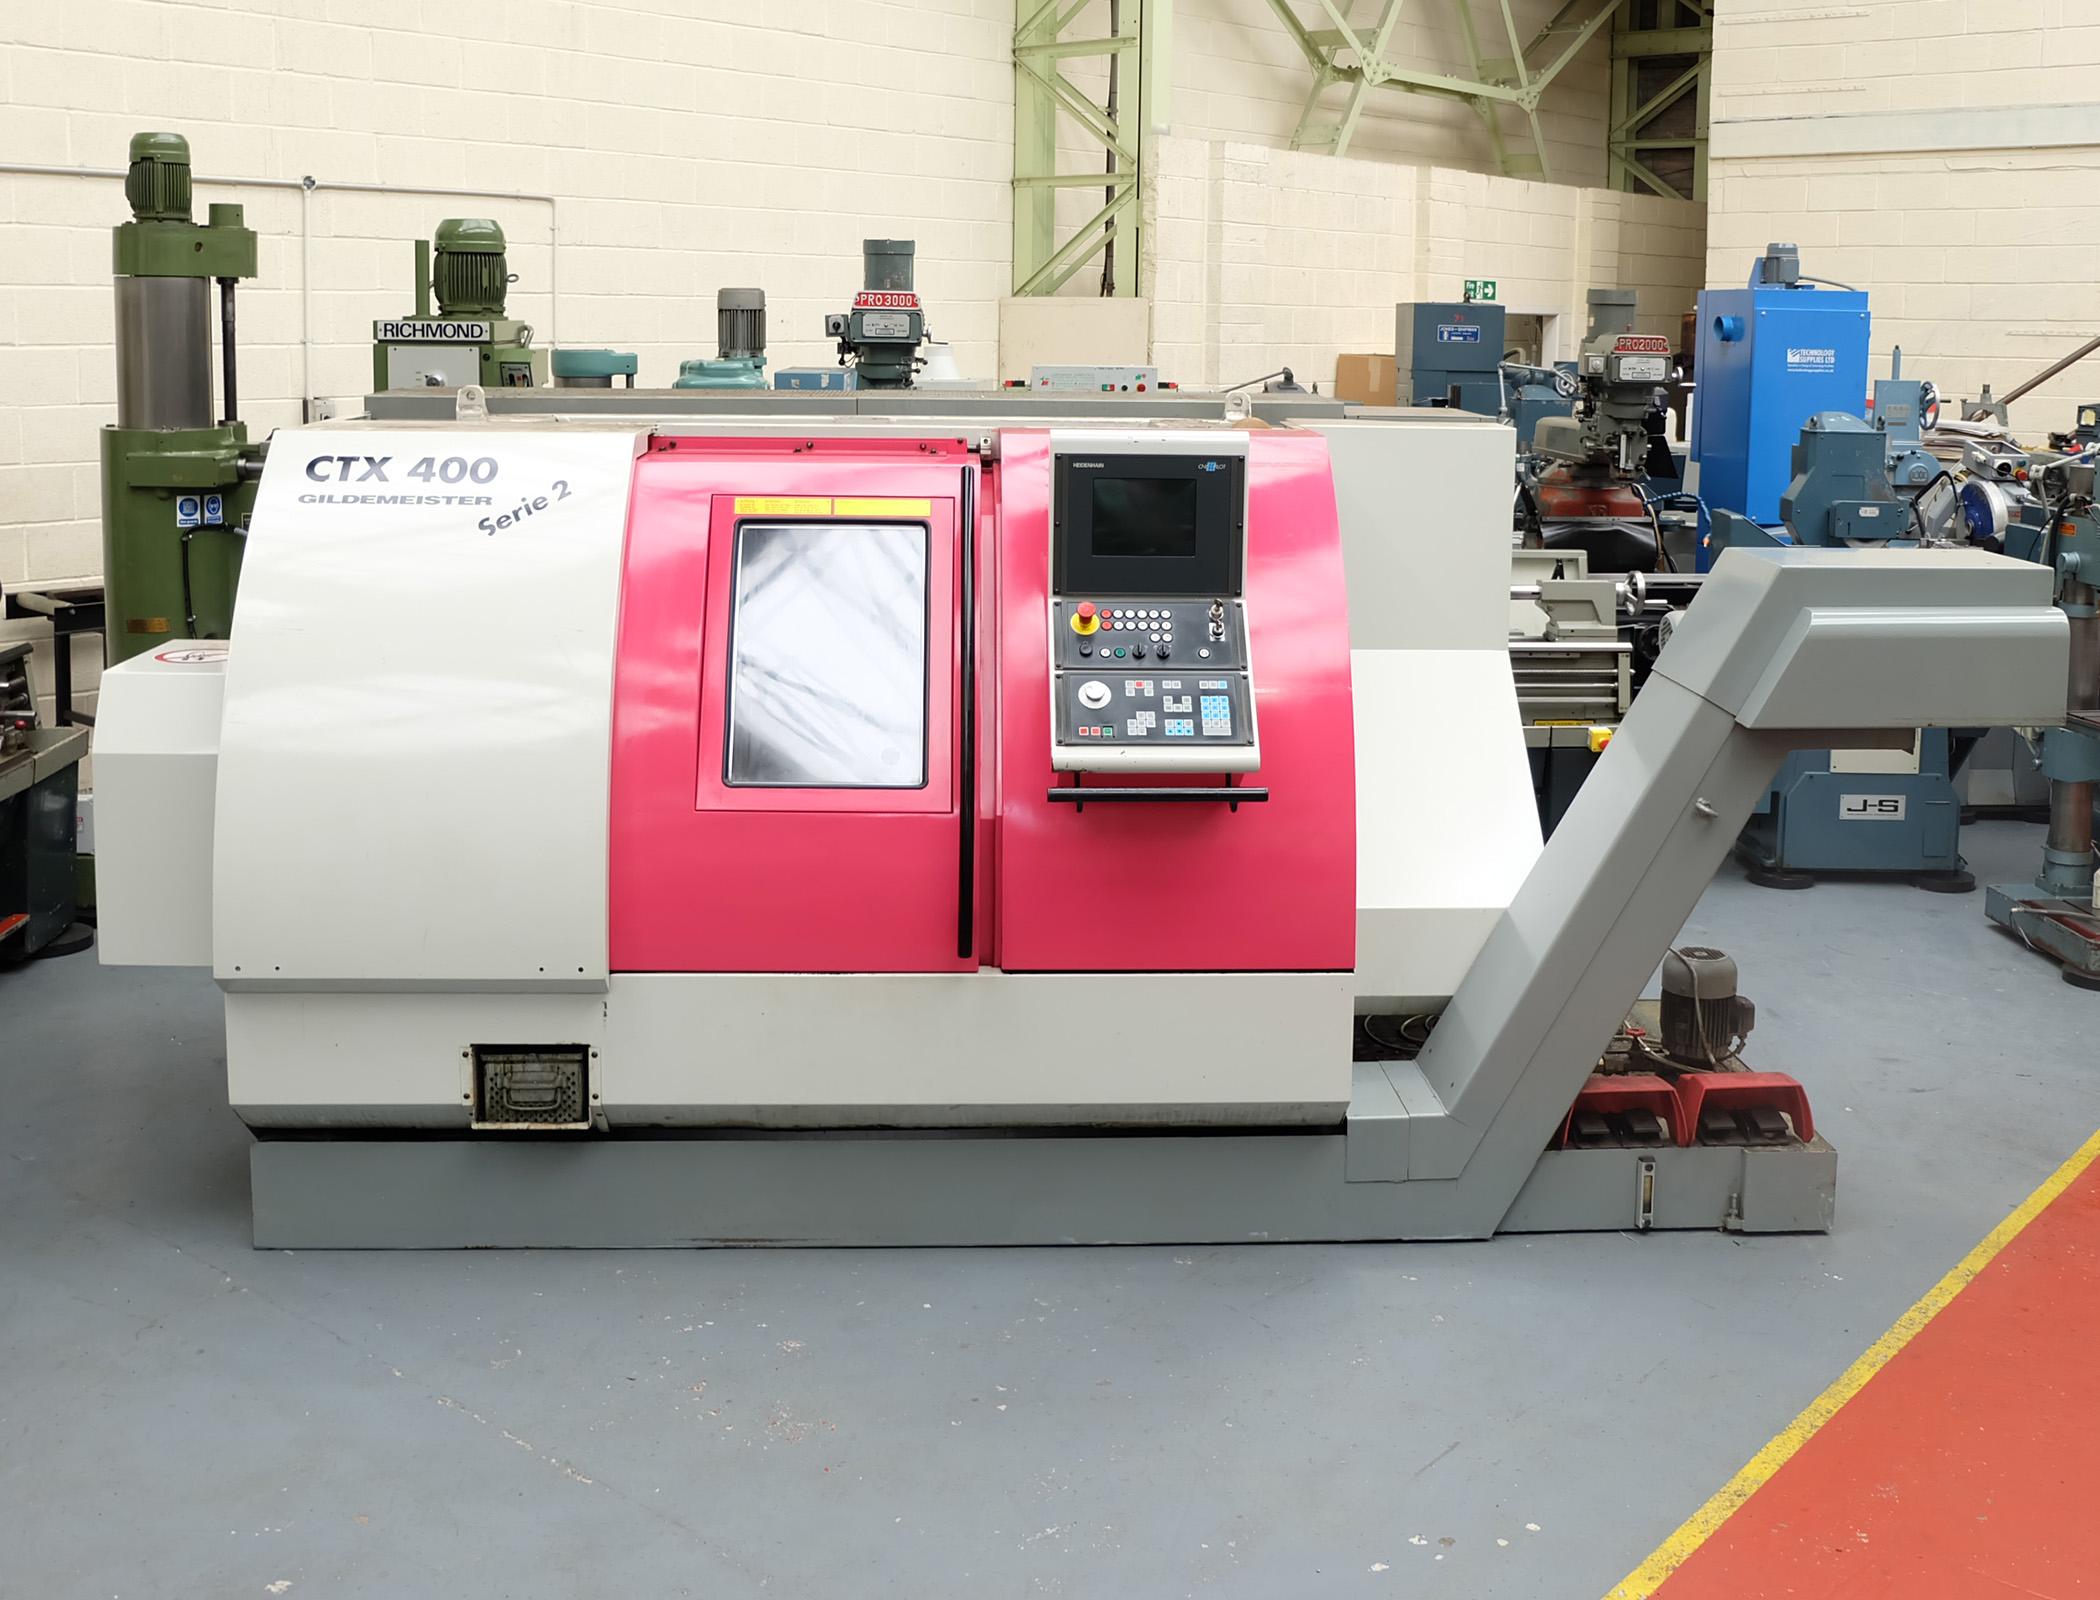 Guildermeister CTX-400 S2. CNC Turning & Milling Centre. With Heidenhain Pilot Control